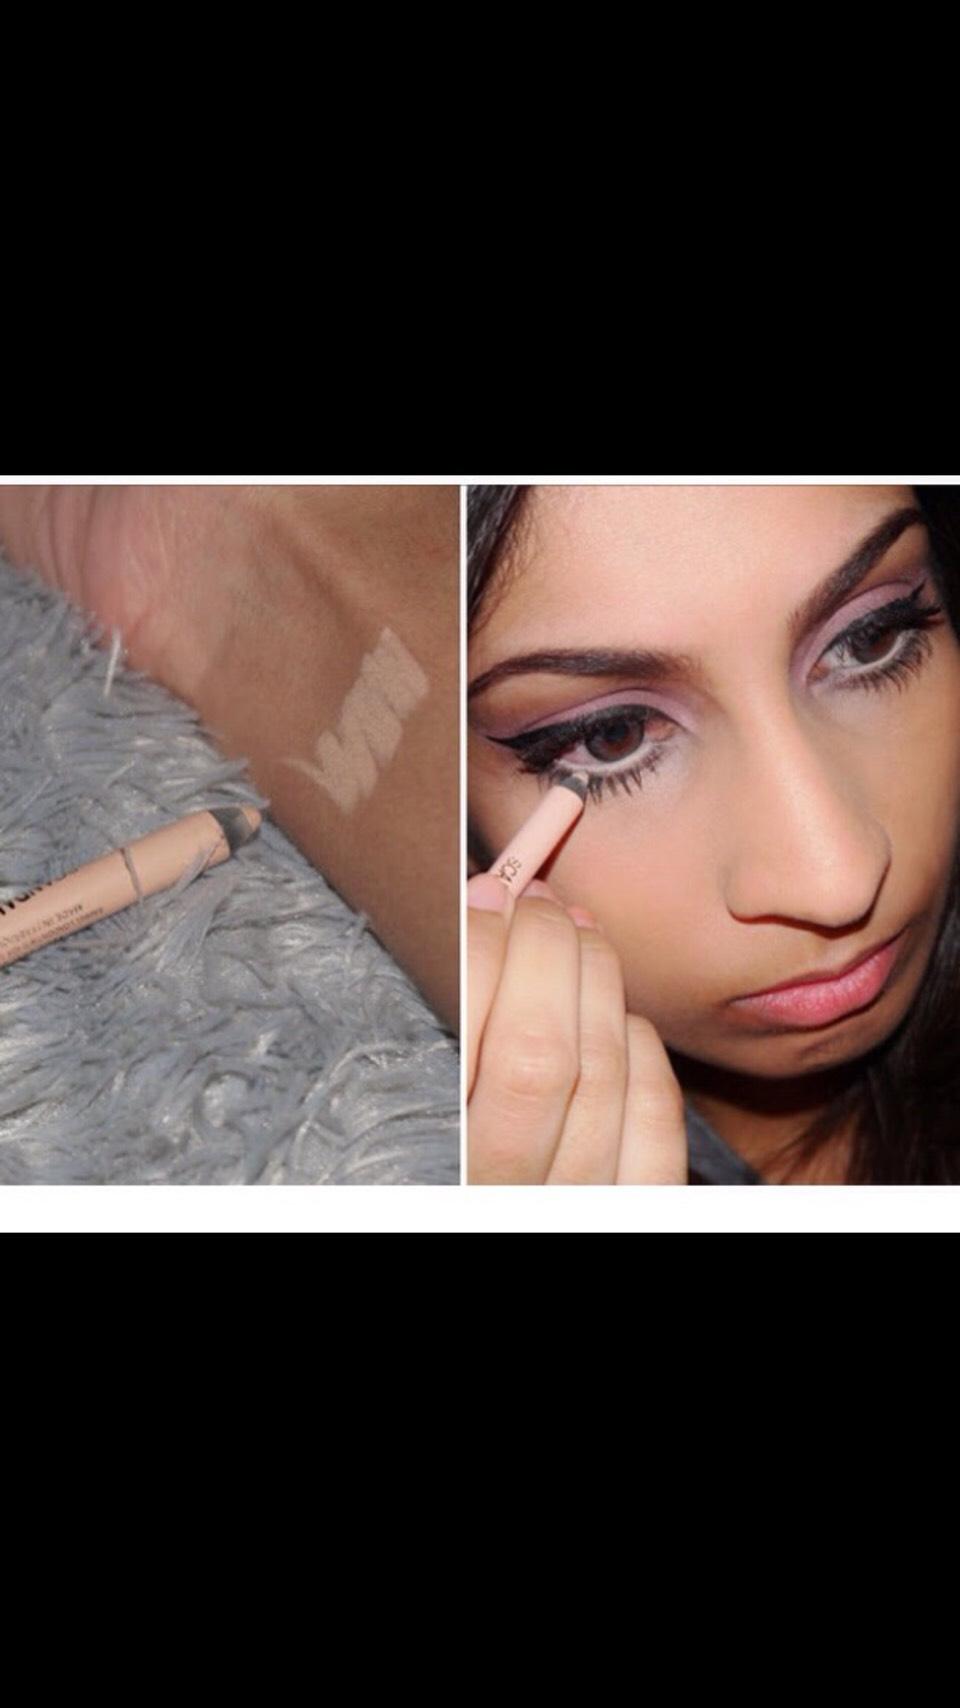 Use light eyeliner to make you're eyes pop, look bigger and fuller👀